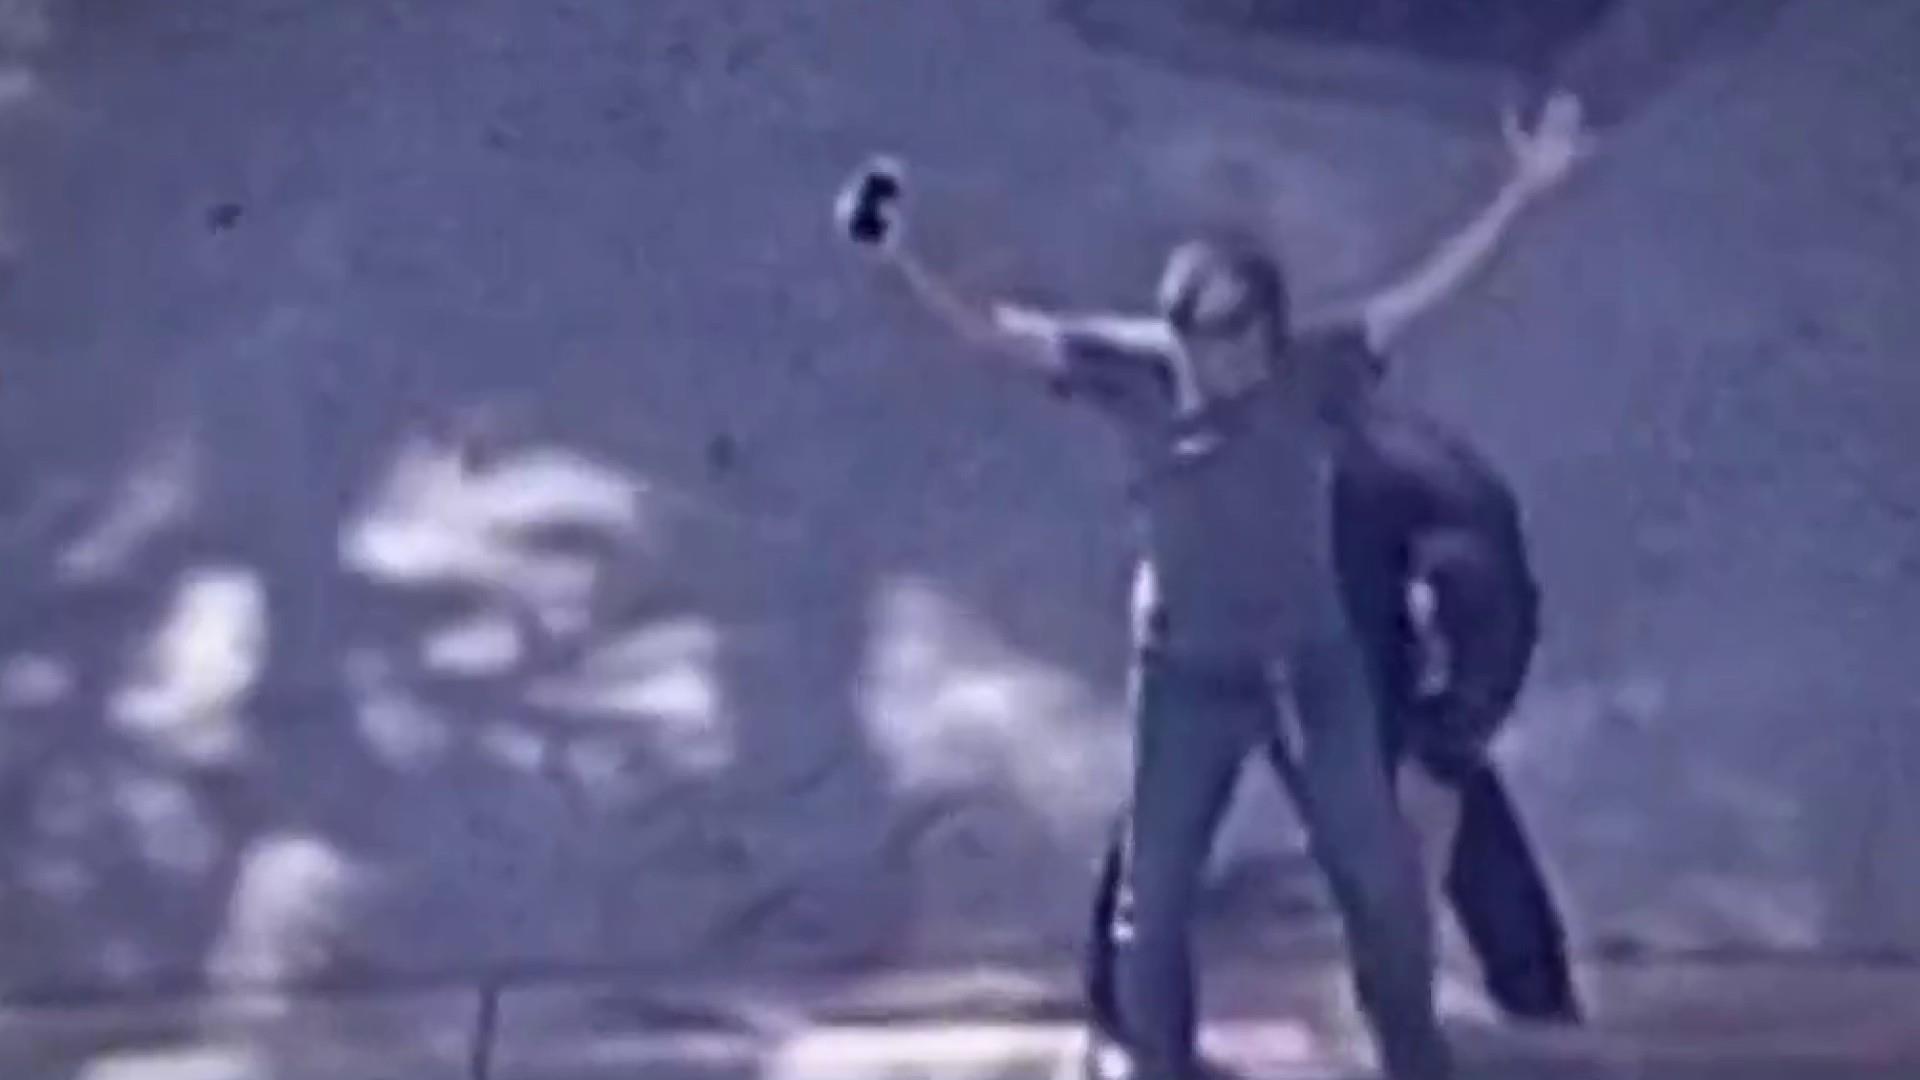 Techmeme: Officials identify the San Bruno shooter as Nasim